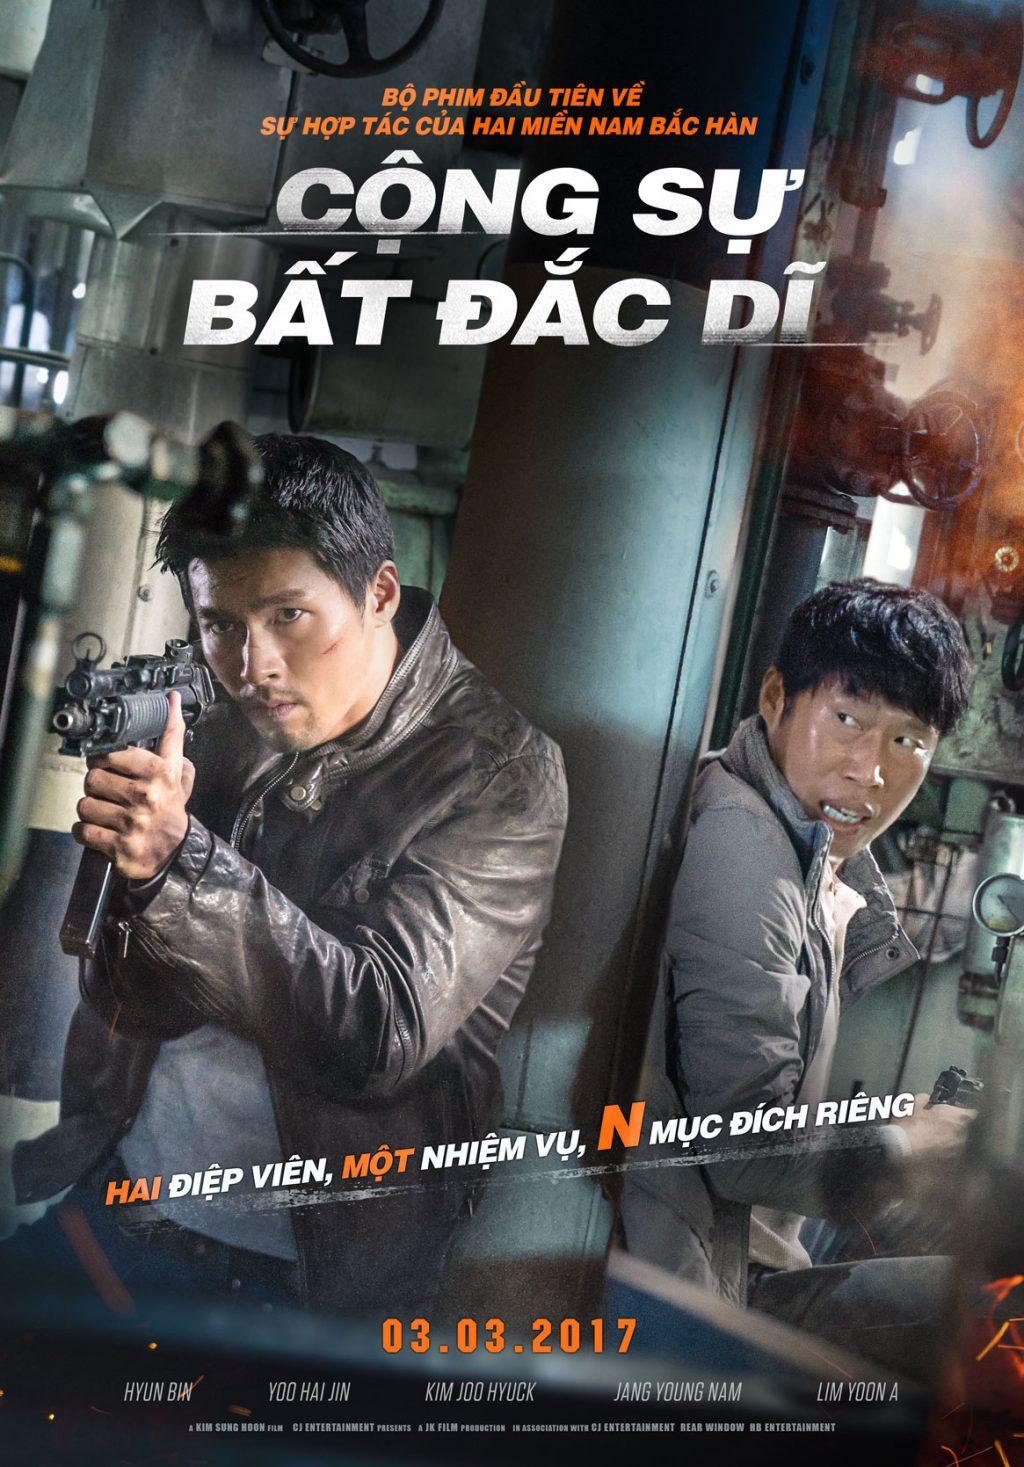 CONG SU BAT DAC DI - teaser poster